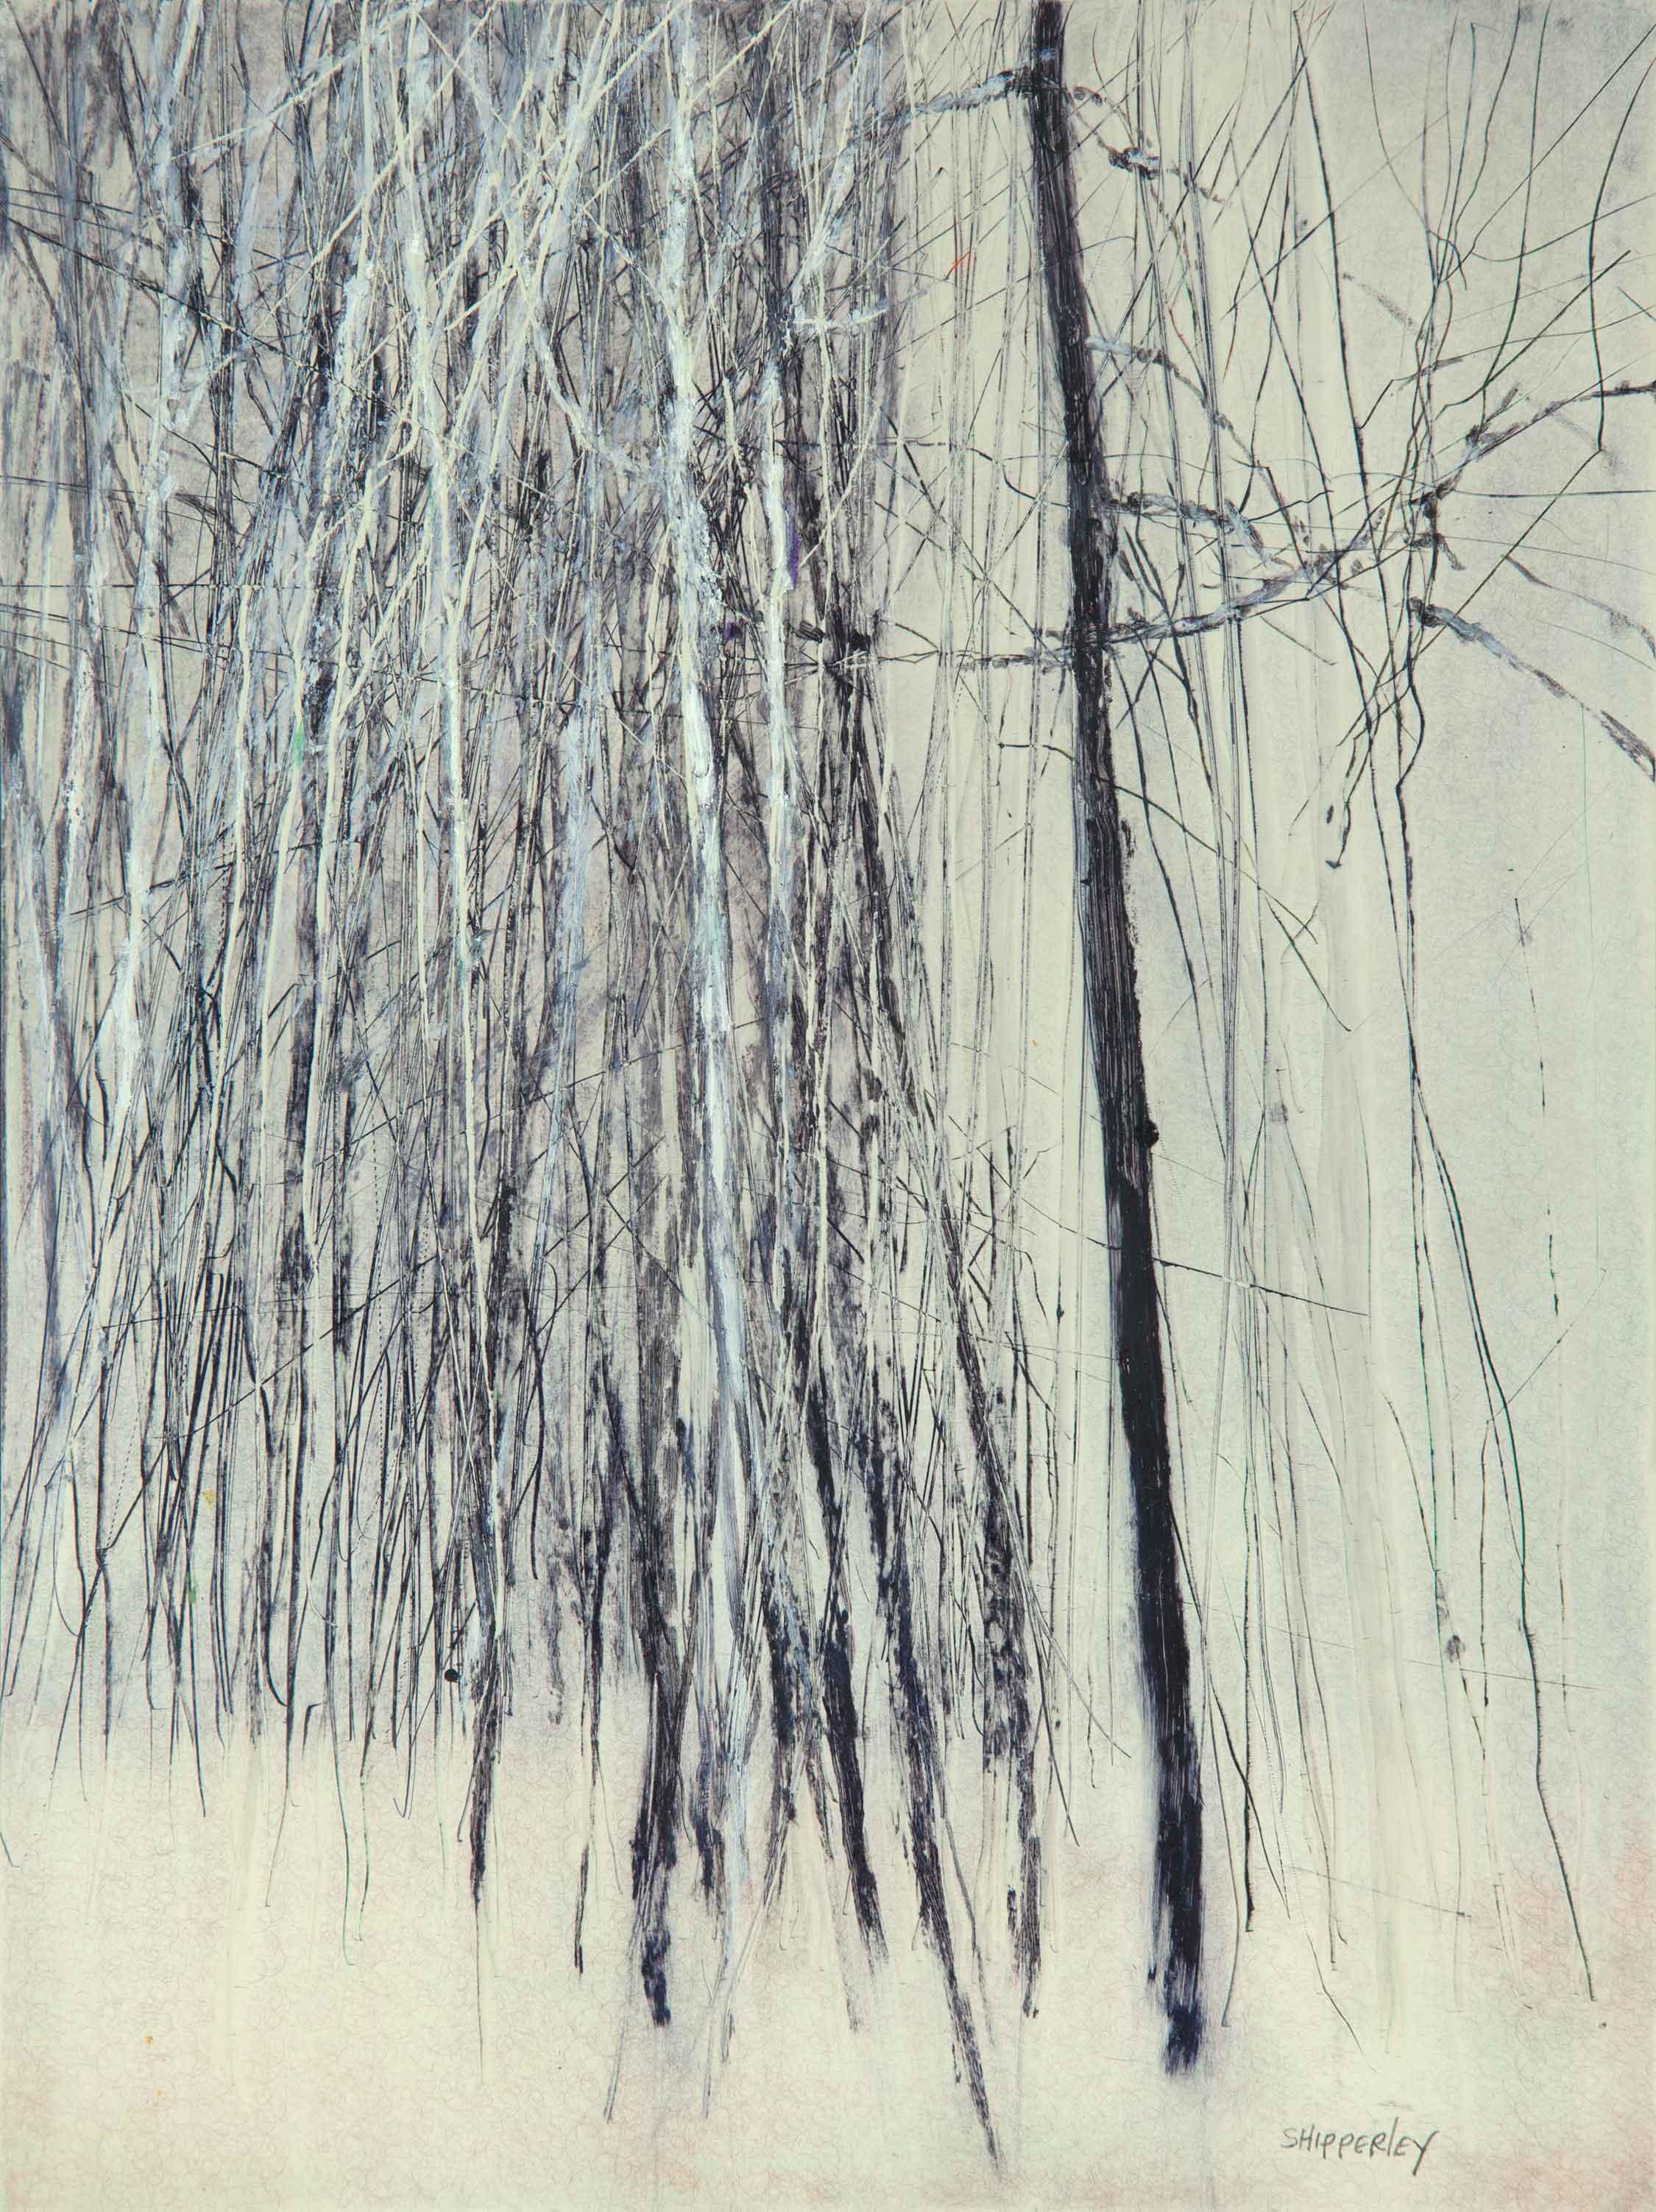 Sonnet of Winter (13 x 10) $1,200